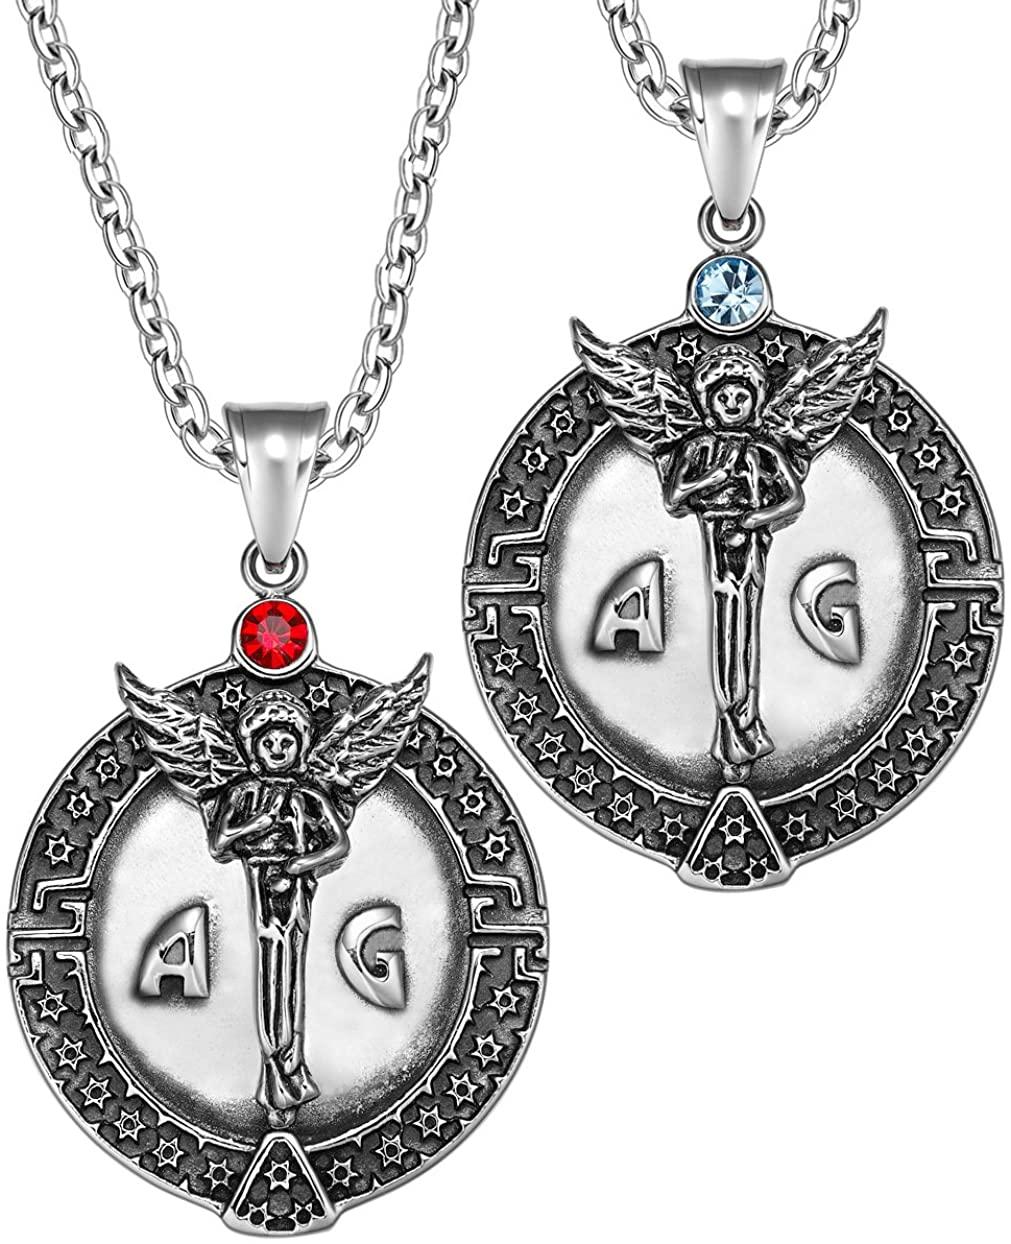 Archangel Michael Star of David Accents Love Copules or Best Friends Protection Amulets Set Necklaces